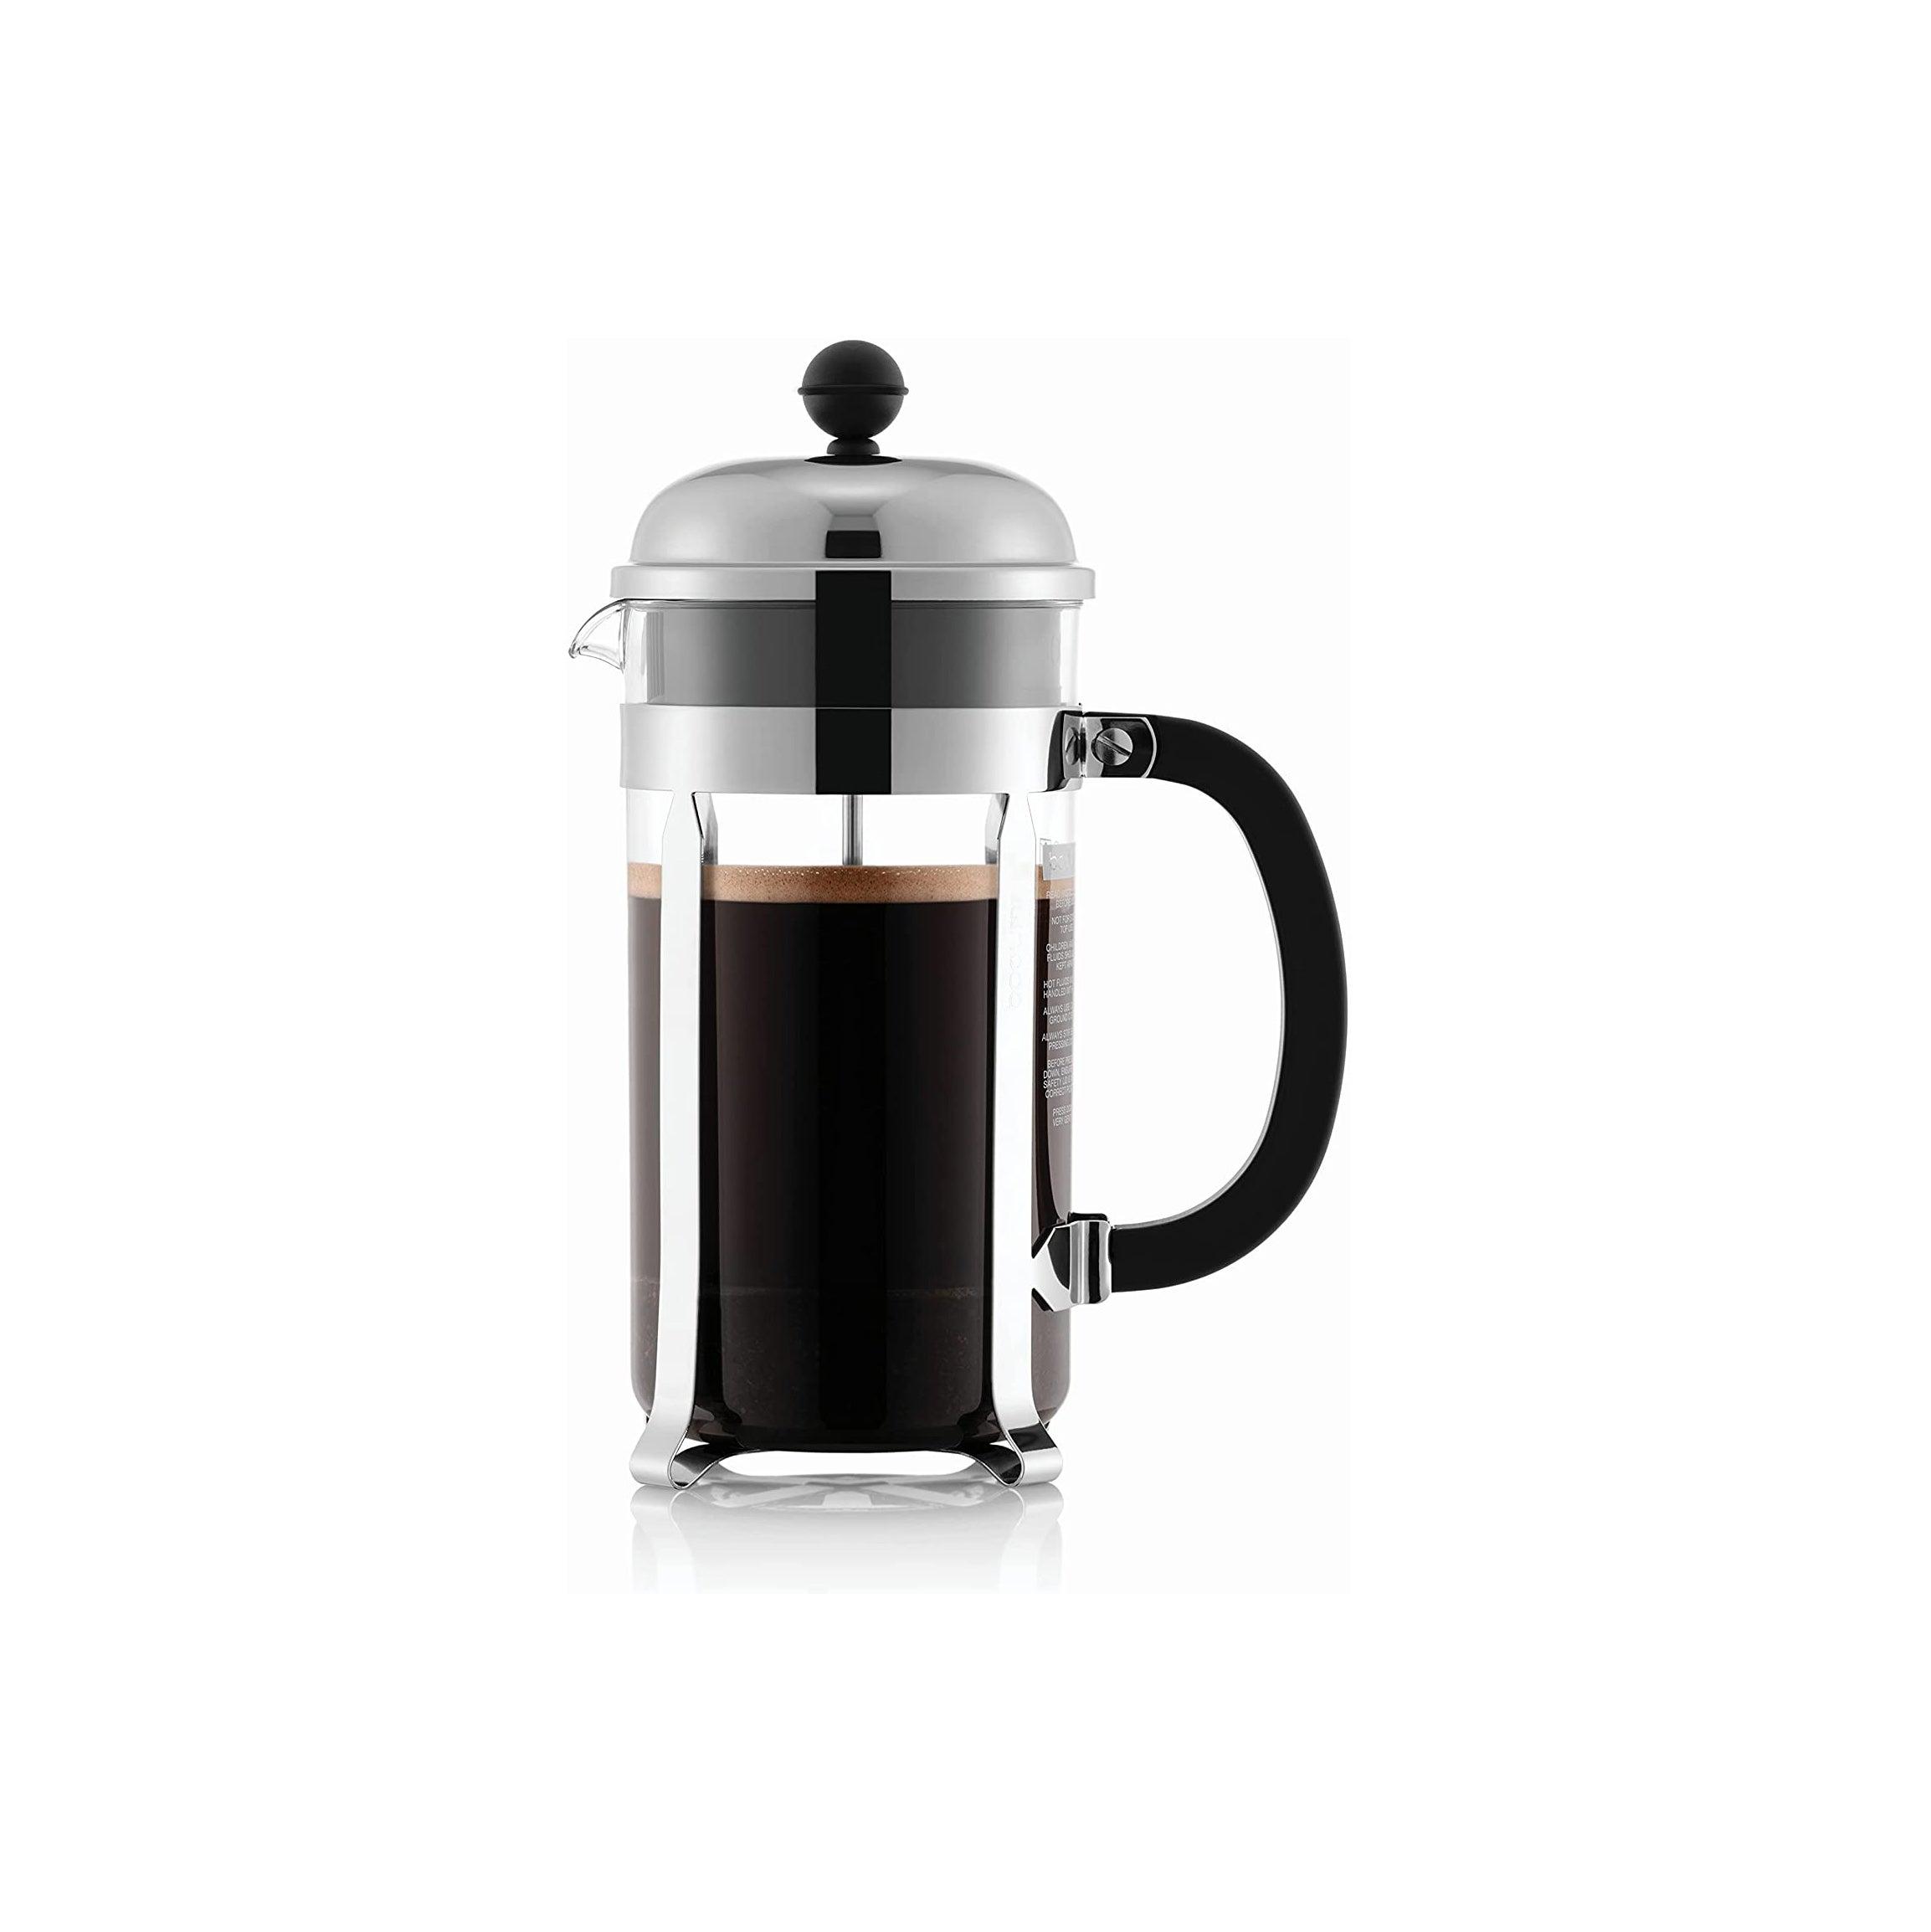 Bodum french press coffee marker